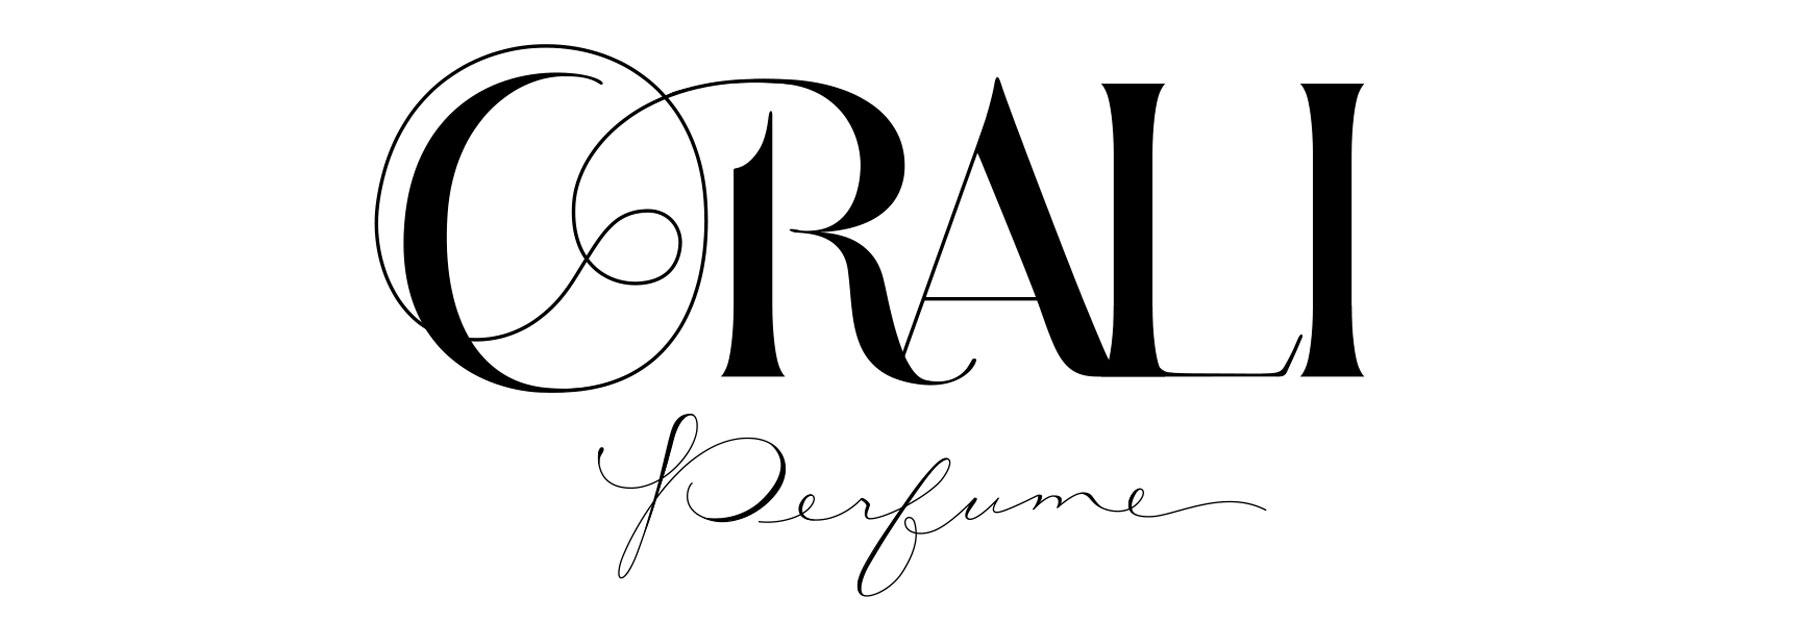 ceci_johnson_ceci_new_york_orali_perfume_custom_branding_logo_design_business_collateral_illustration_v242_02